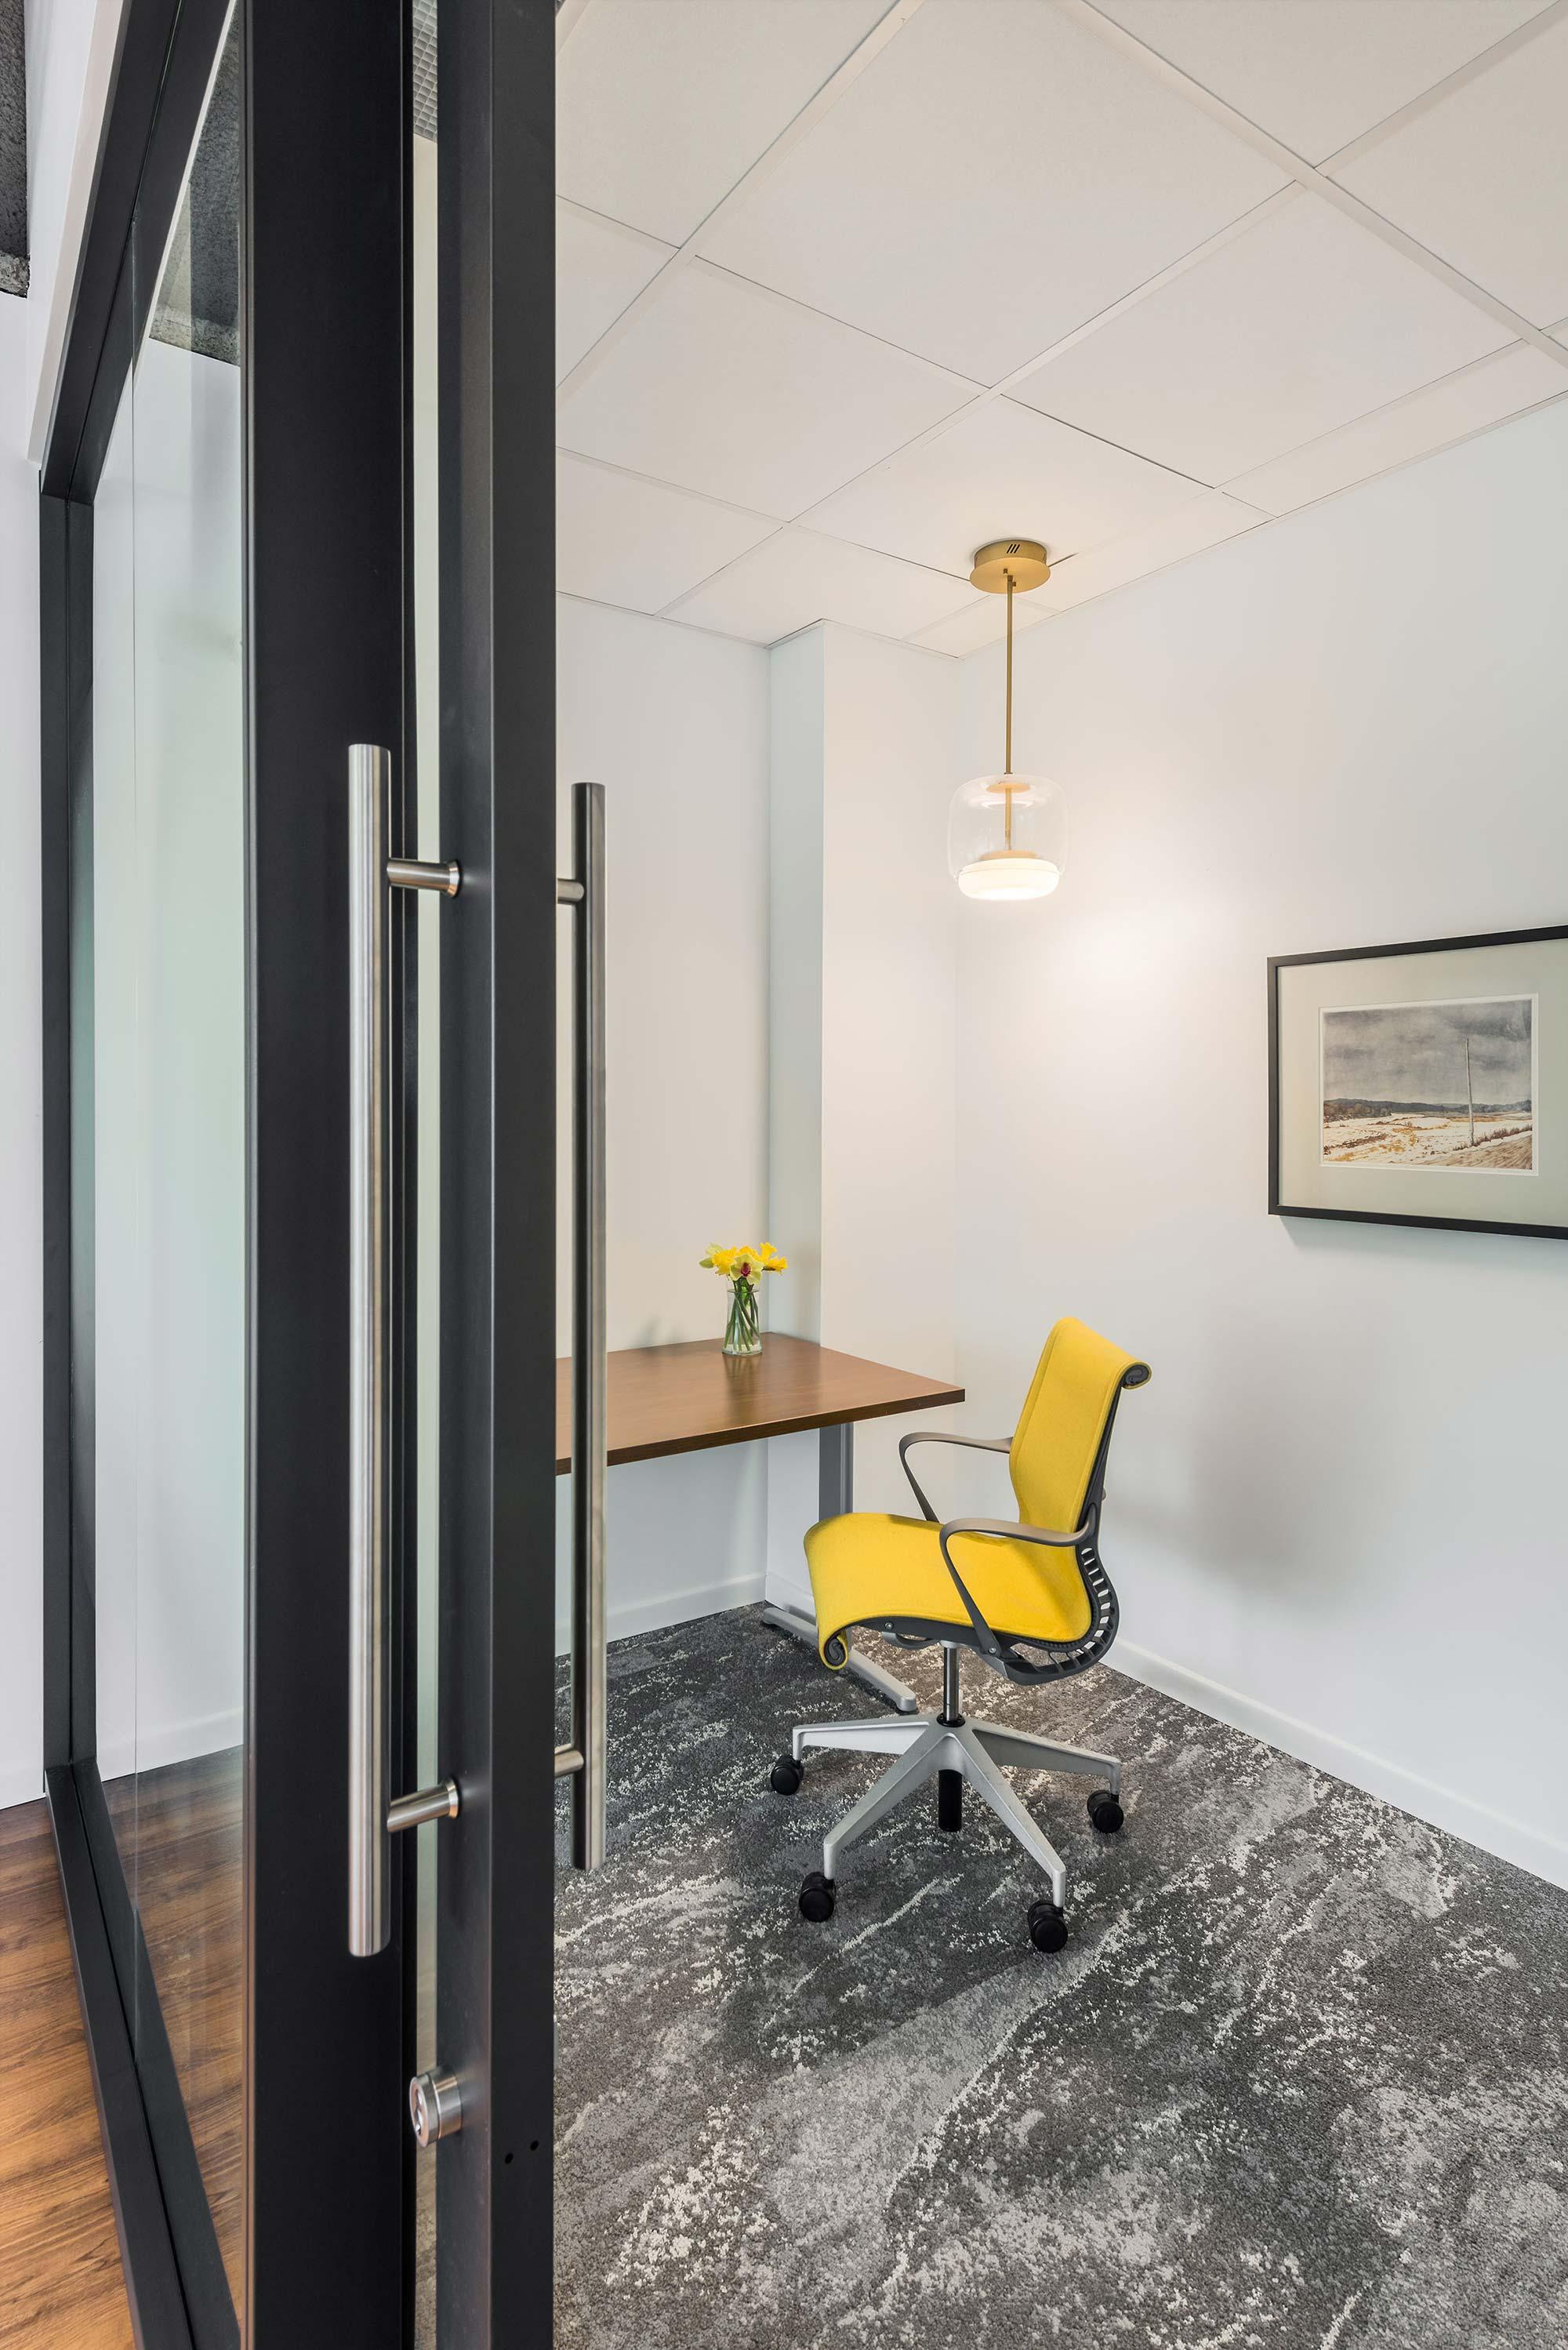 interior-design-financial-services-yellow-chair.jpg